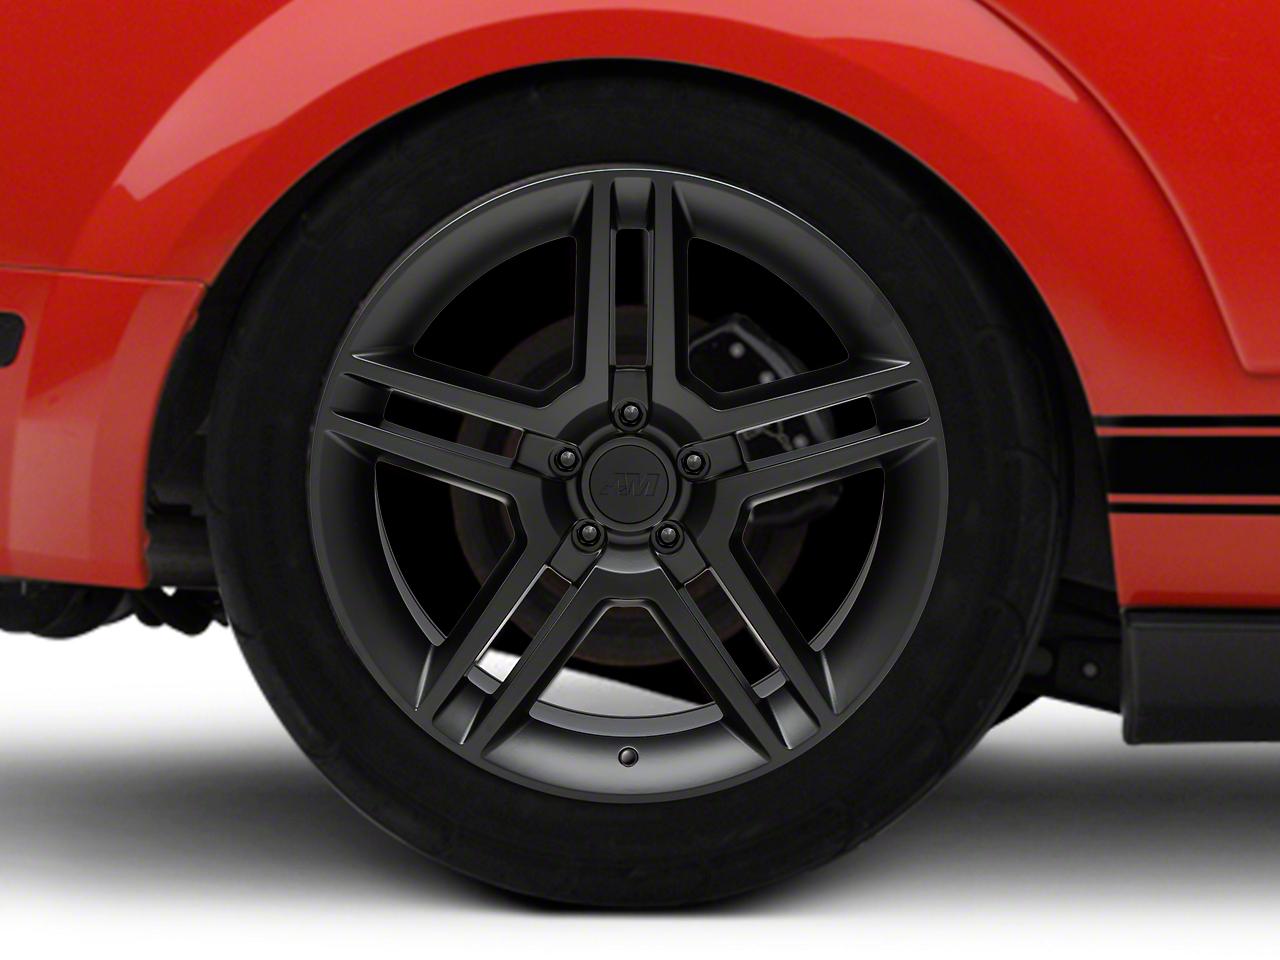 2010 GT500 Style Matte Black Wheel - 19x10 (05-14 All)